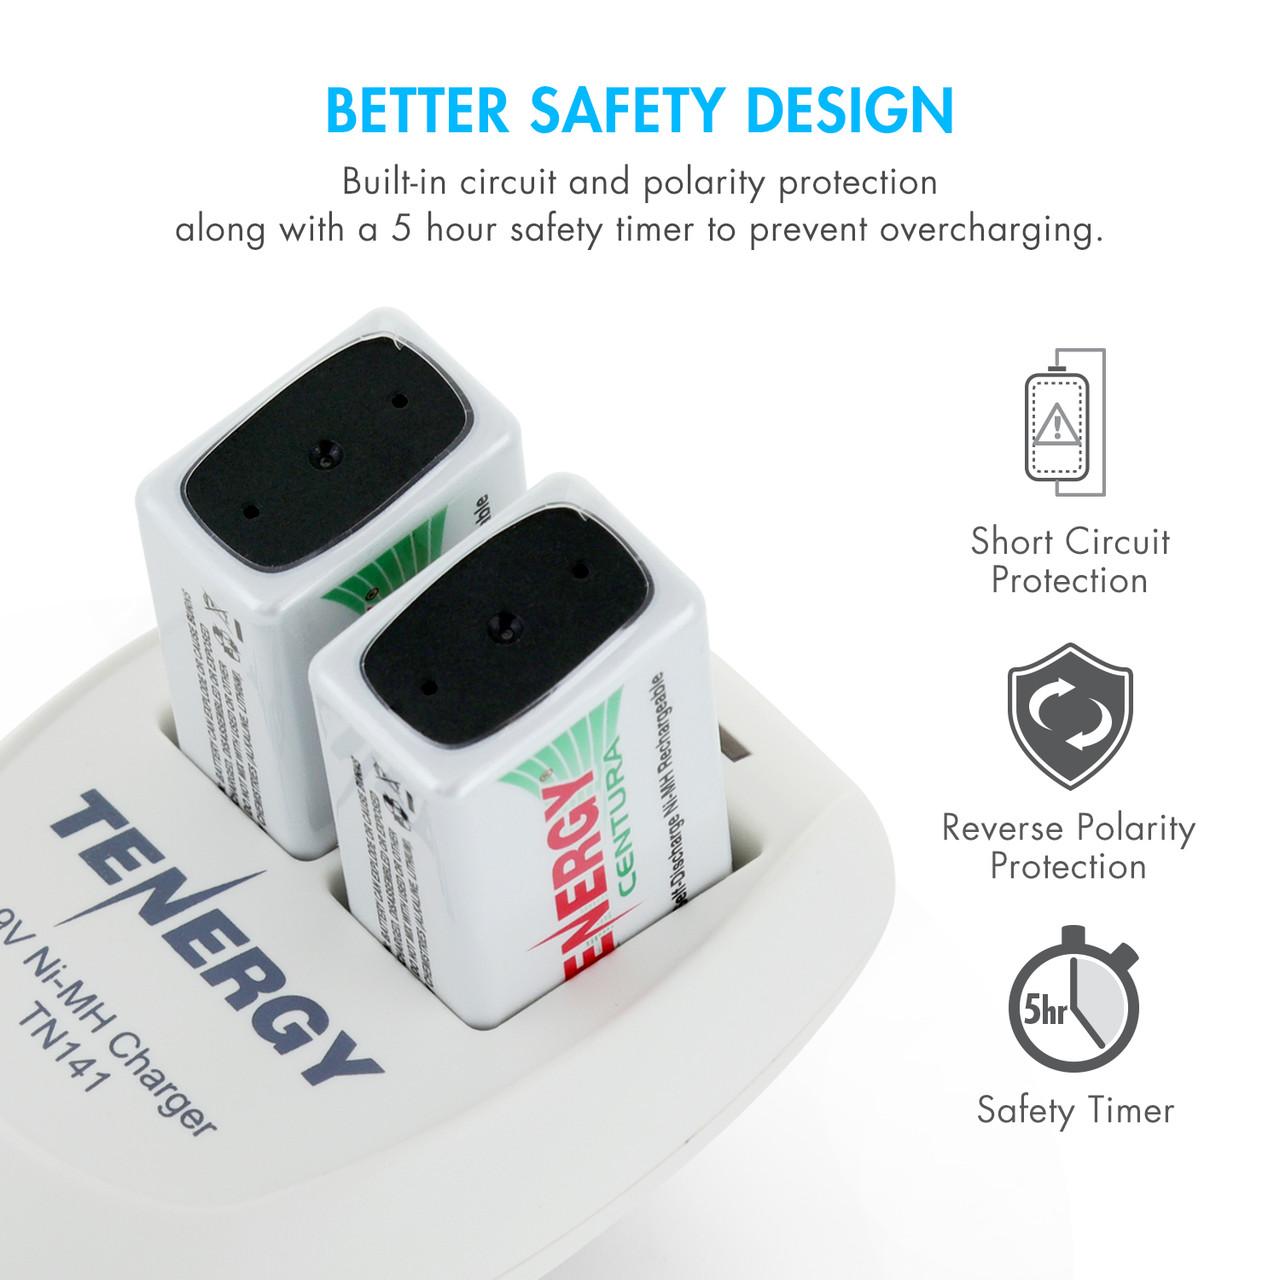 Combo: Tenergy TN141 2-bay 9V Charger + 4pcs Premium 9V 250mAh NiMH Rechargeable Batteries